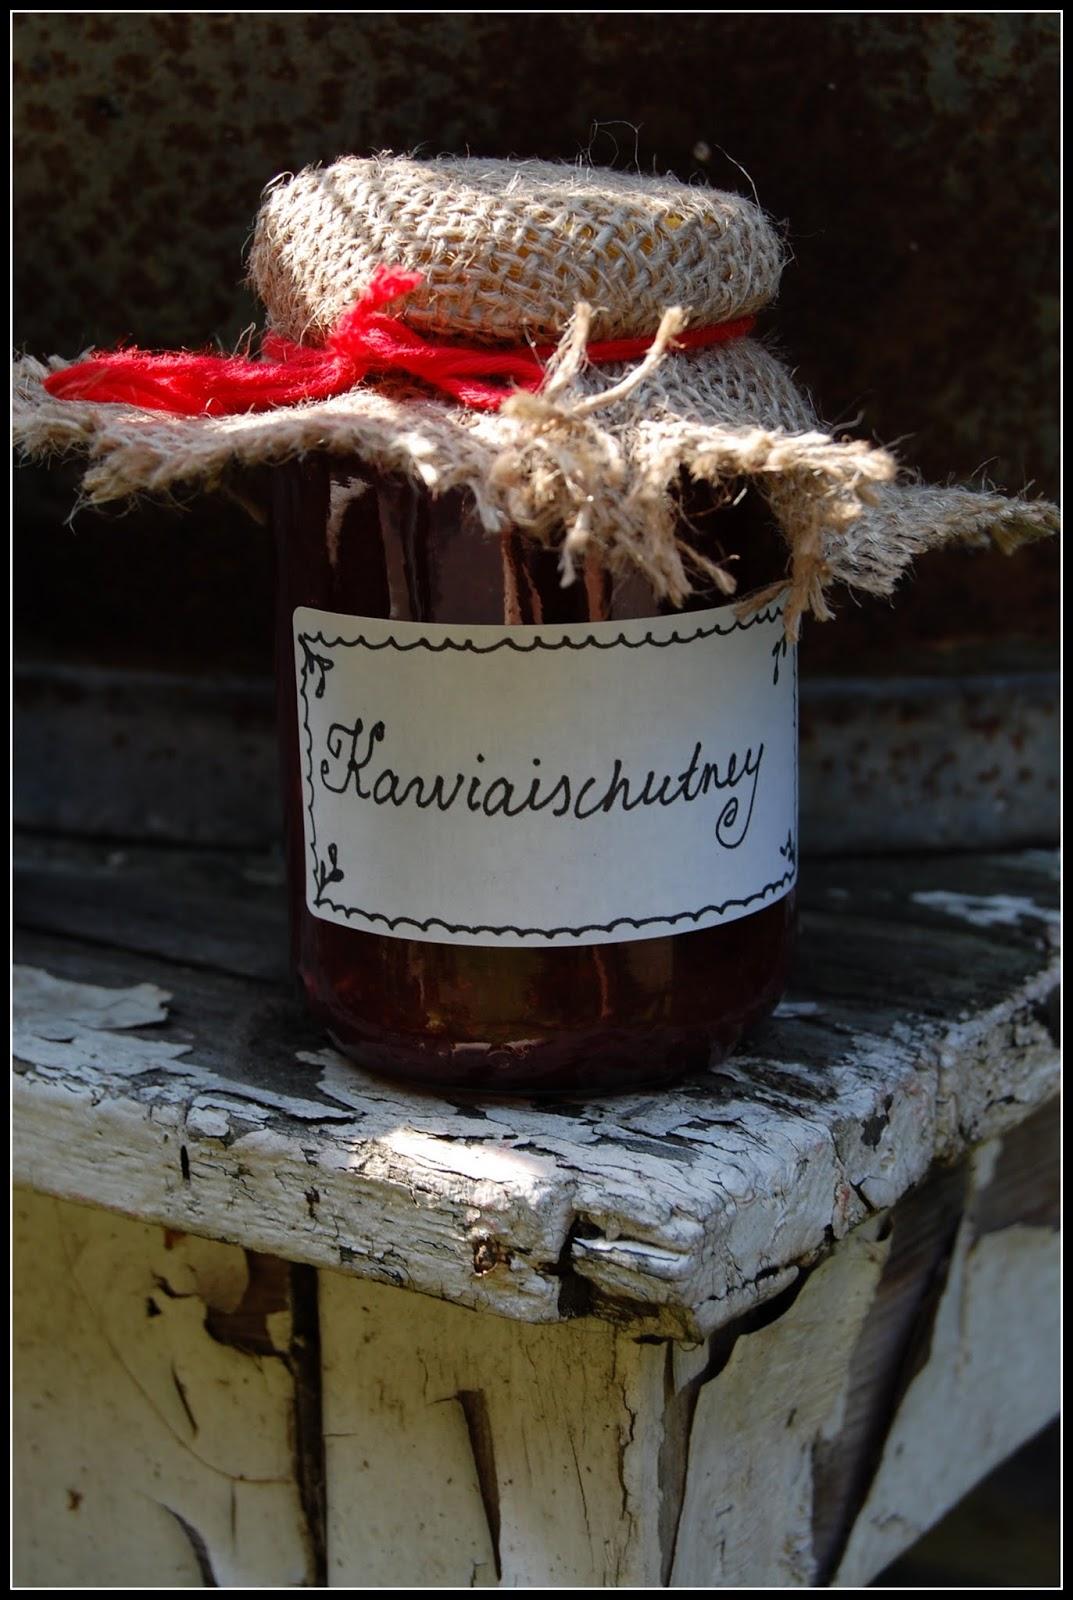 Karviaischutney